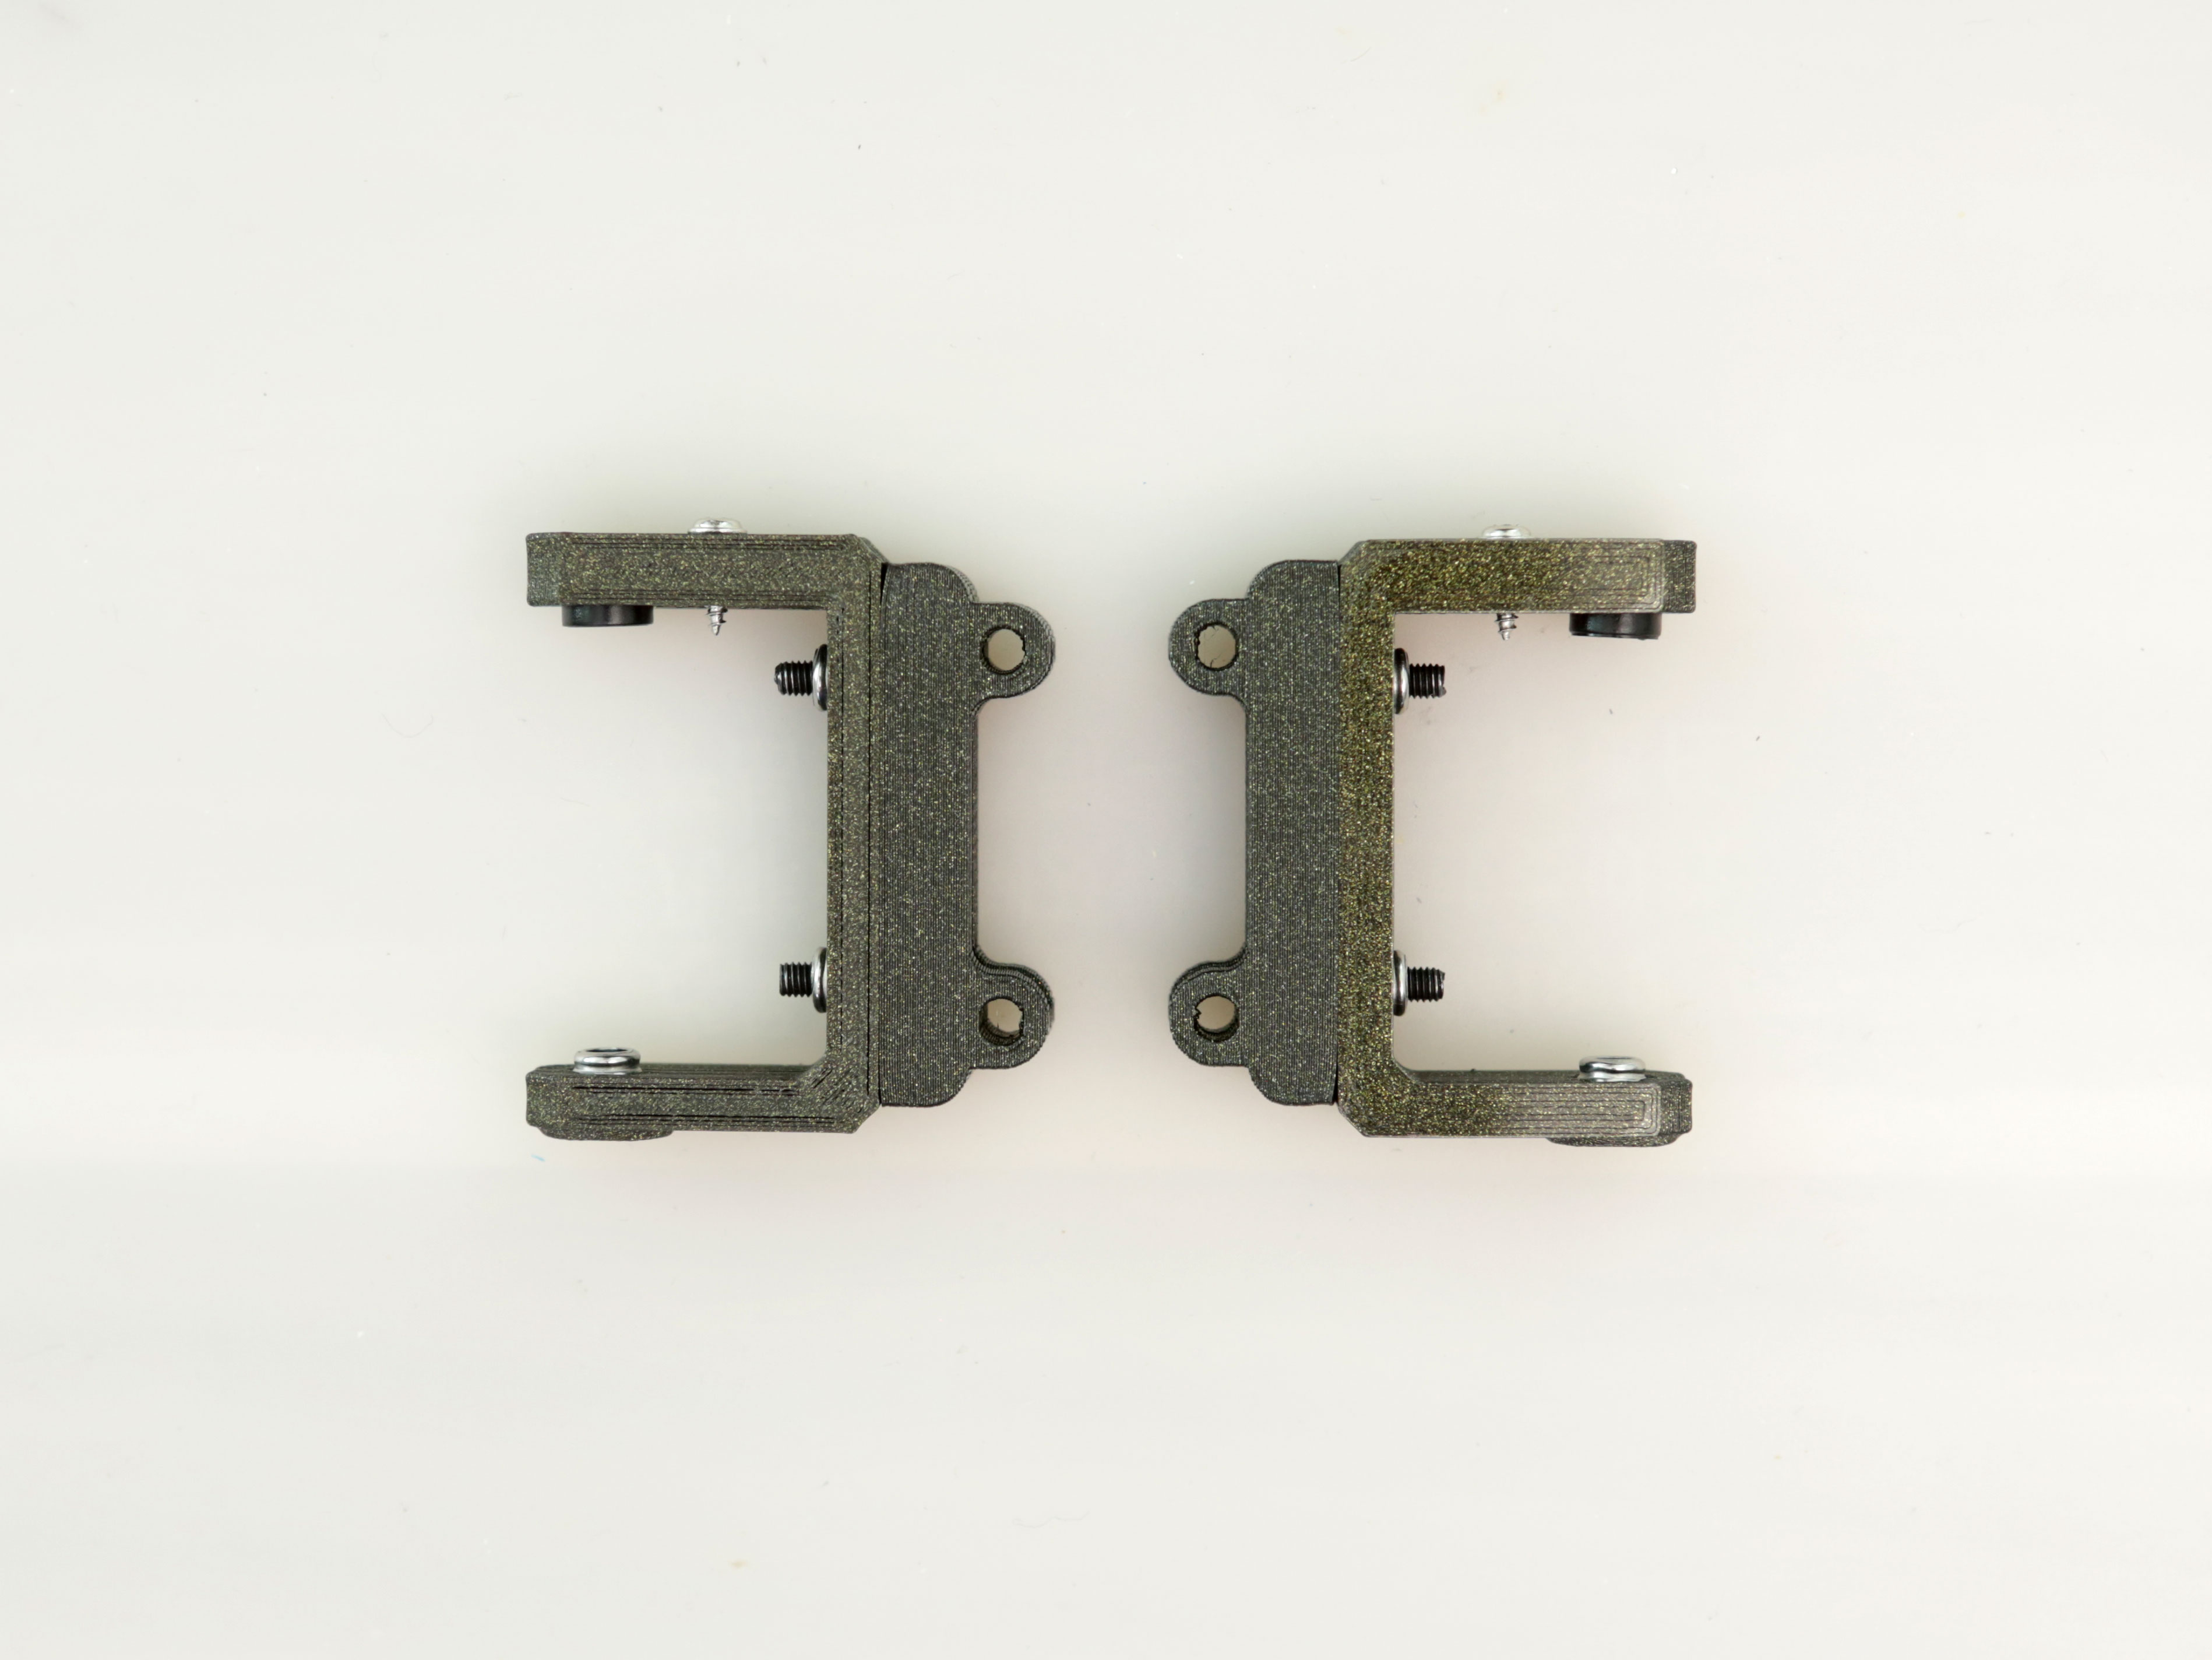 3d_printing_servo-arms-installed.jpg